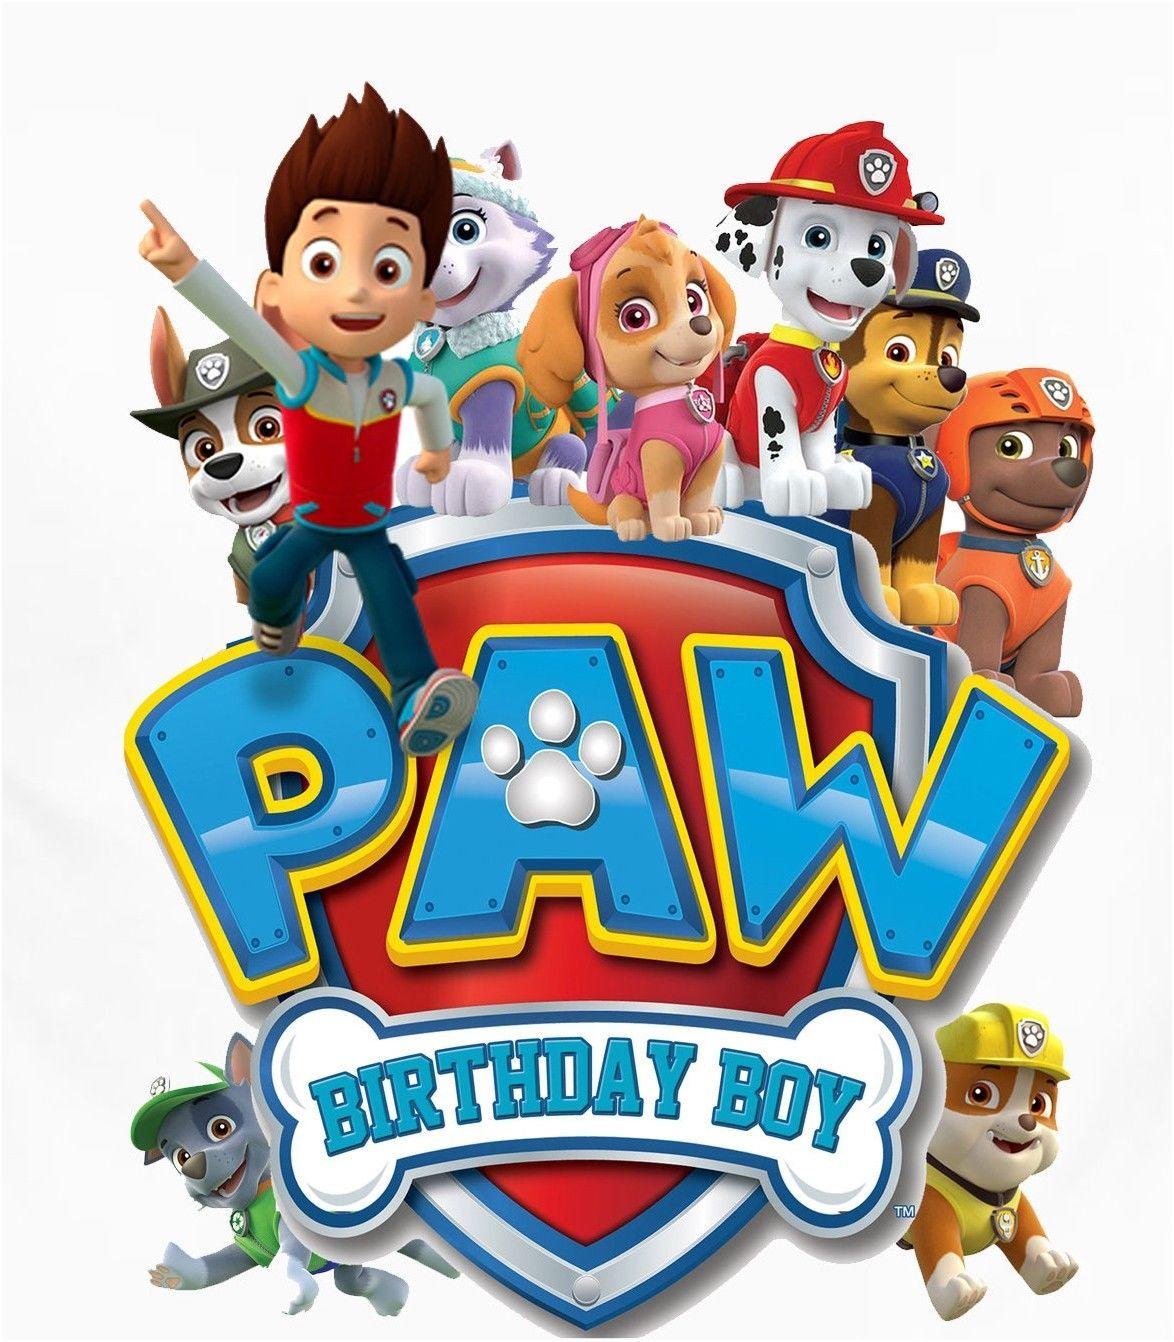 2 99 Paw Patrol Birthday Boy Shirt Iron On Transfer Ebay Home Garden